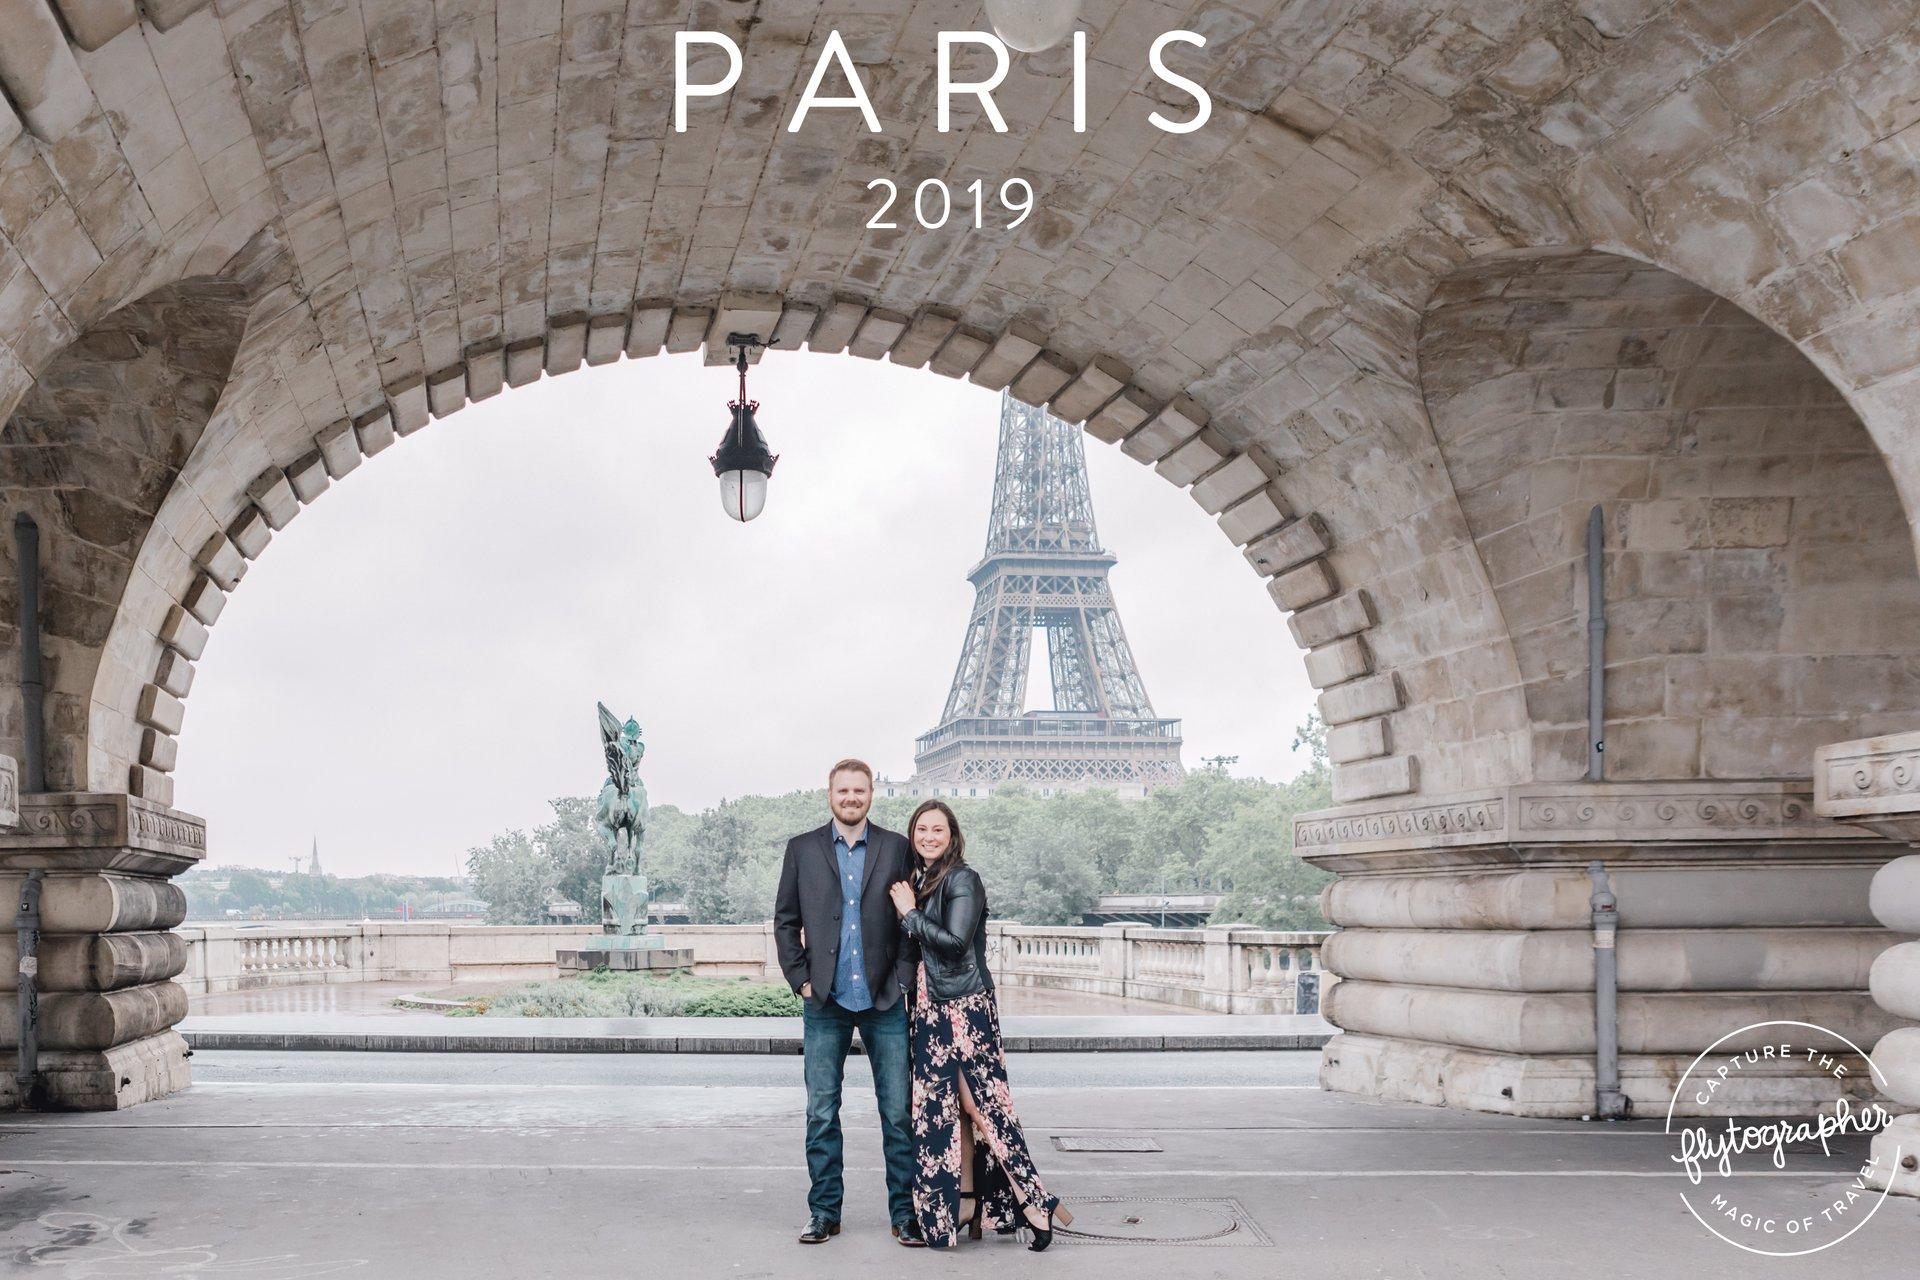 Paris-France-travel-story-Flytographer-70